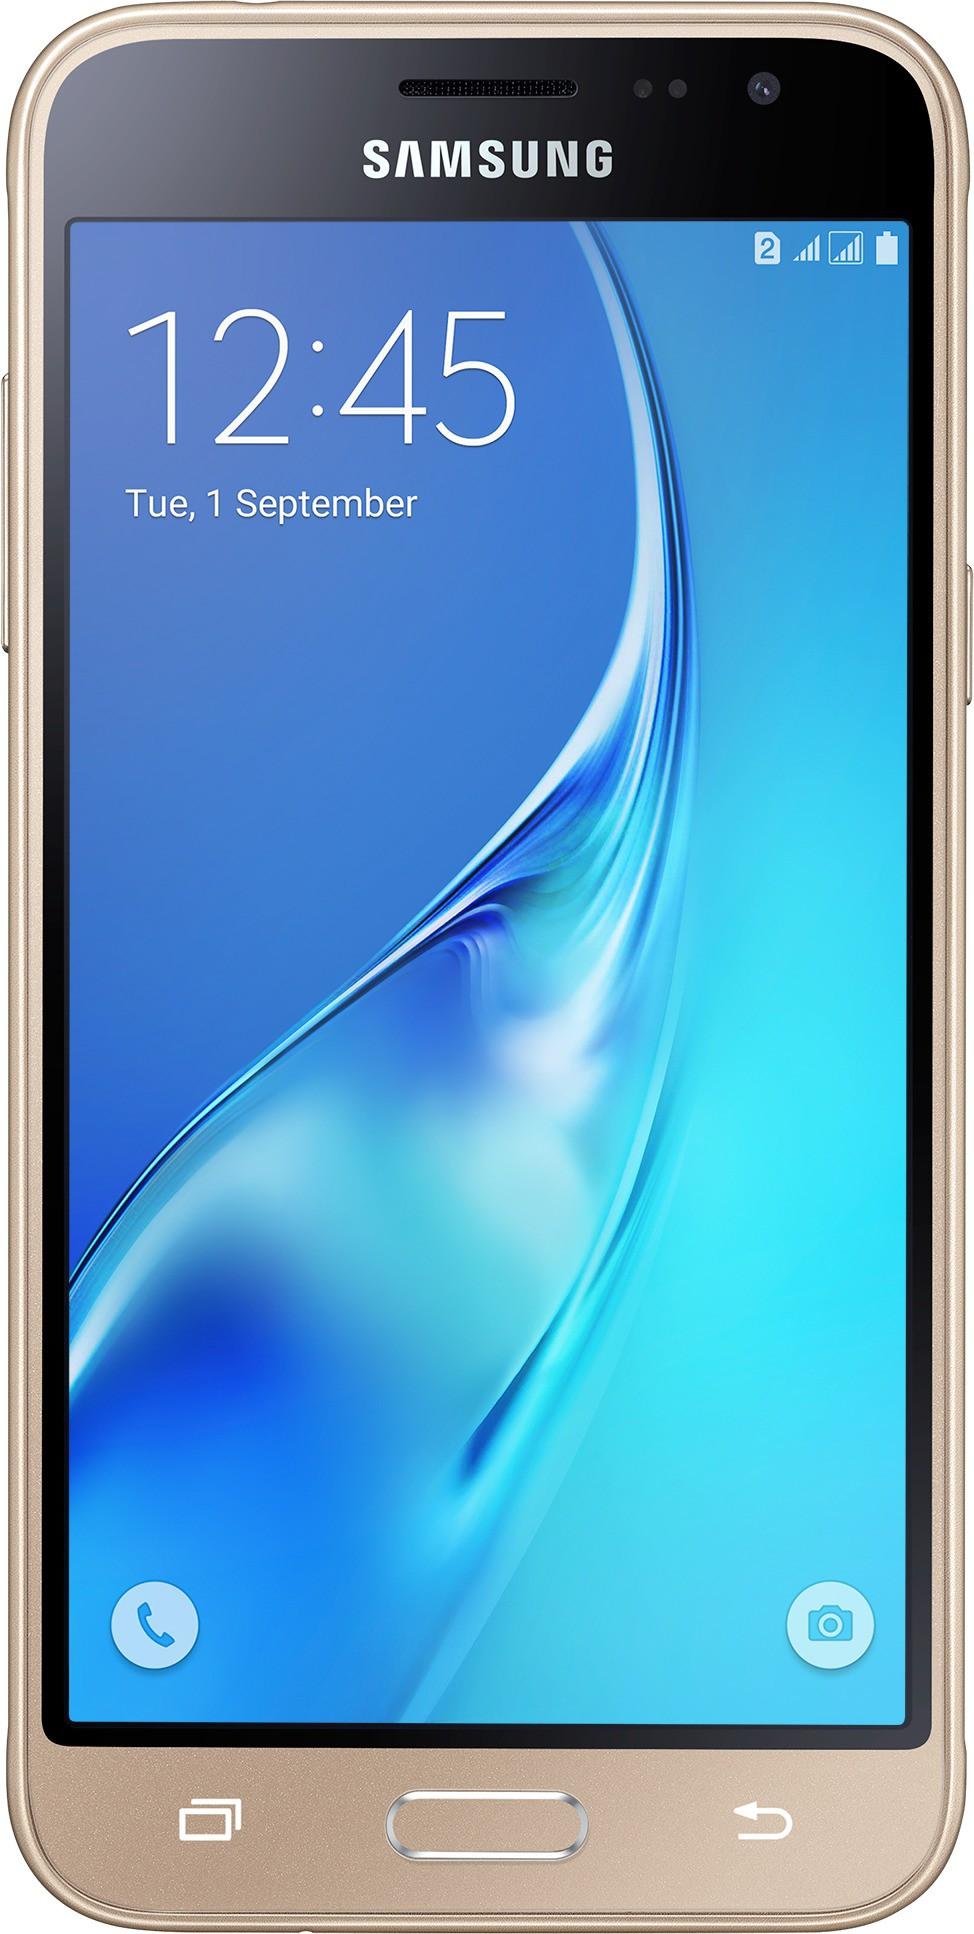 Samsung Galaxy J3 Pro (Gold, 16 GB)(2 GB RAM) image